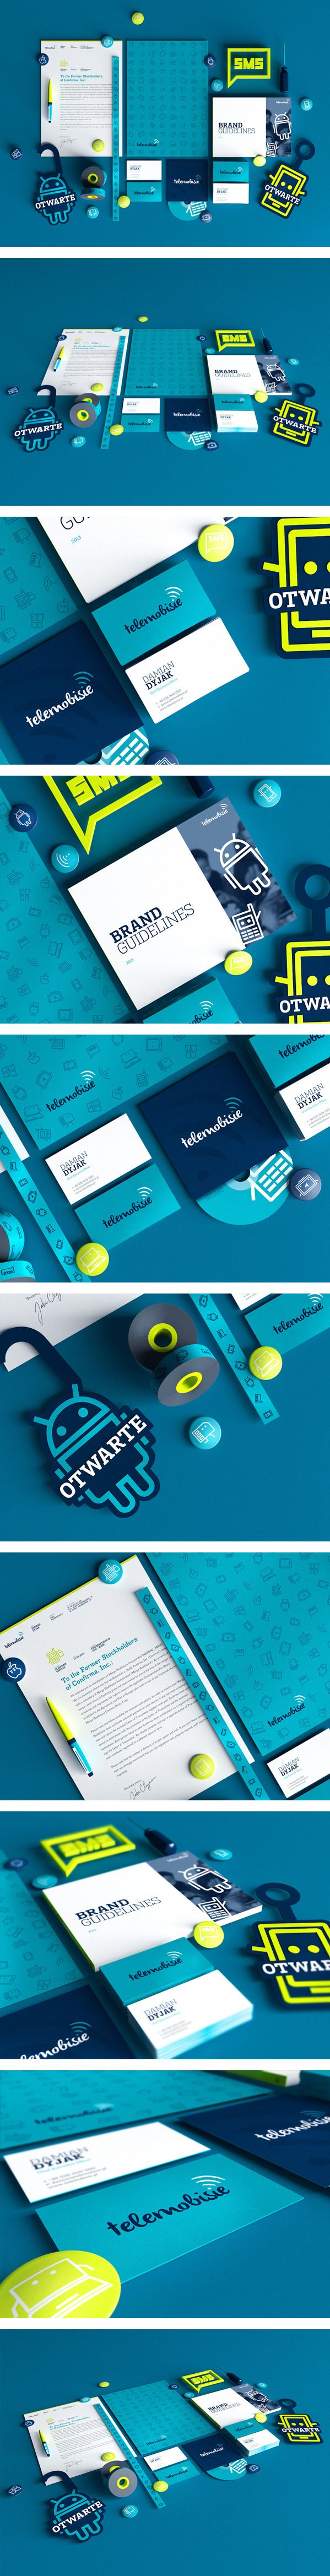 Brand Identity | Corporate Identity | Graphic Design | Telemobisie identity